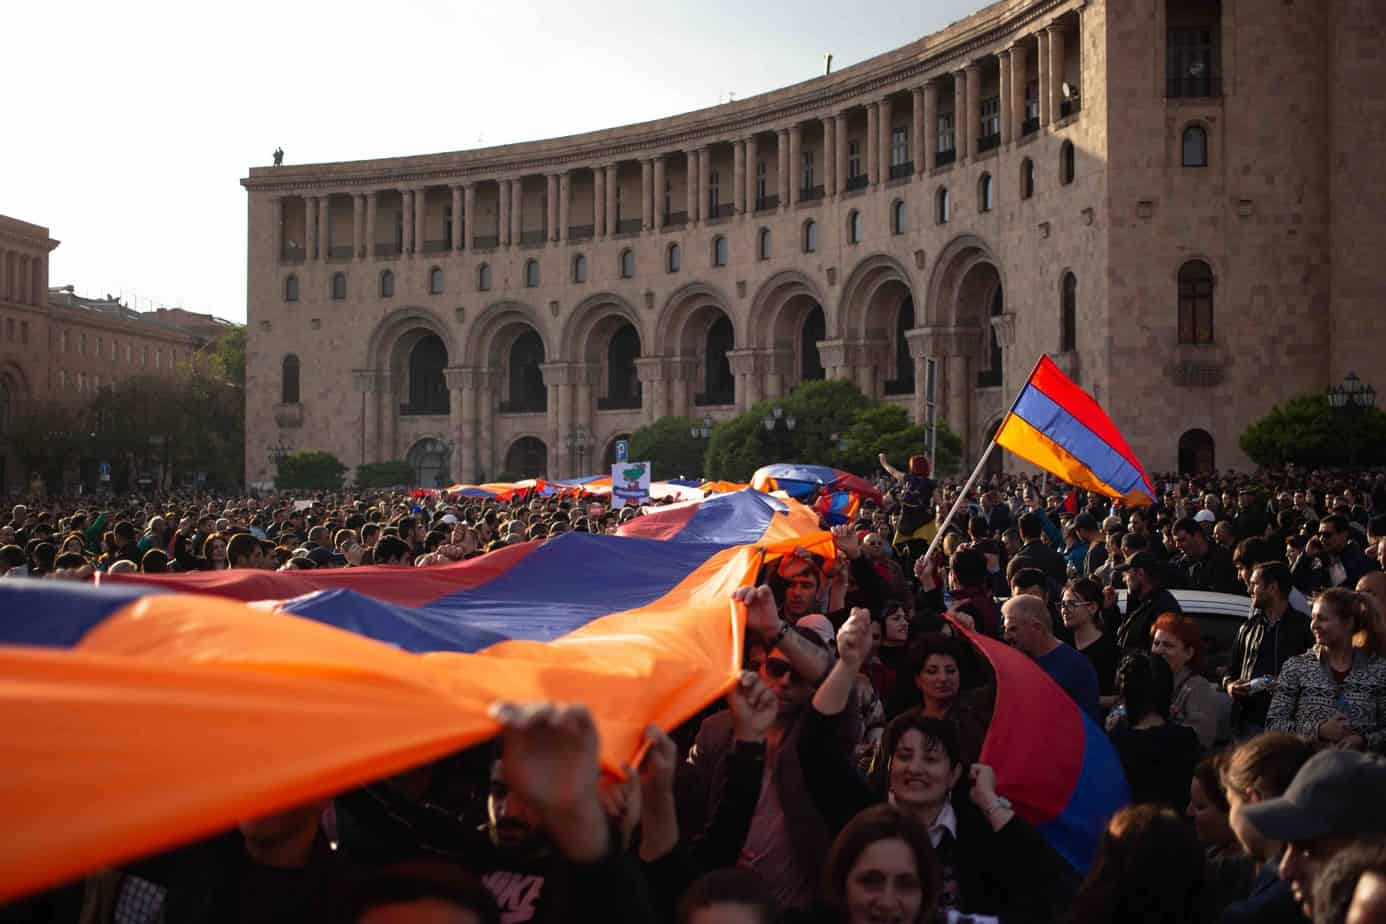 Nagorno-Karabakh: nationalist politics at geo-political cross-roads